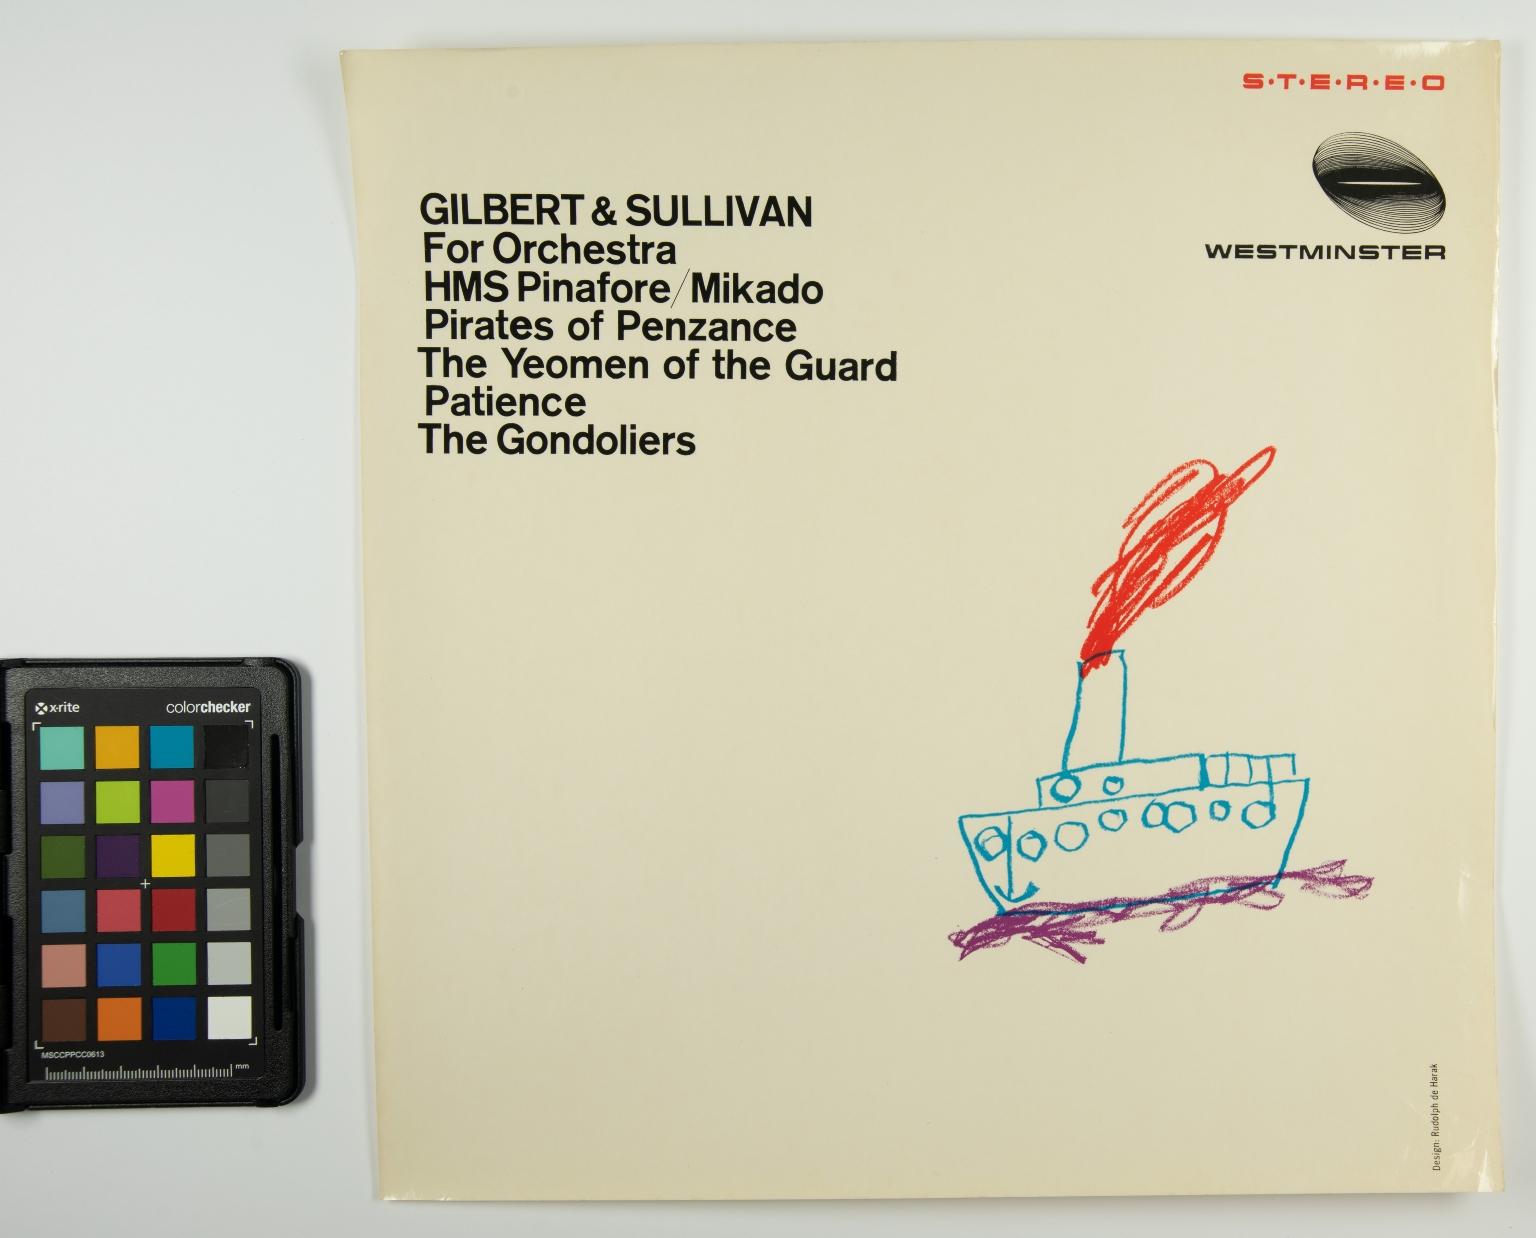 Gilbert & Sullivan for Orchestra